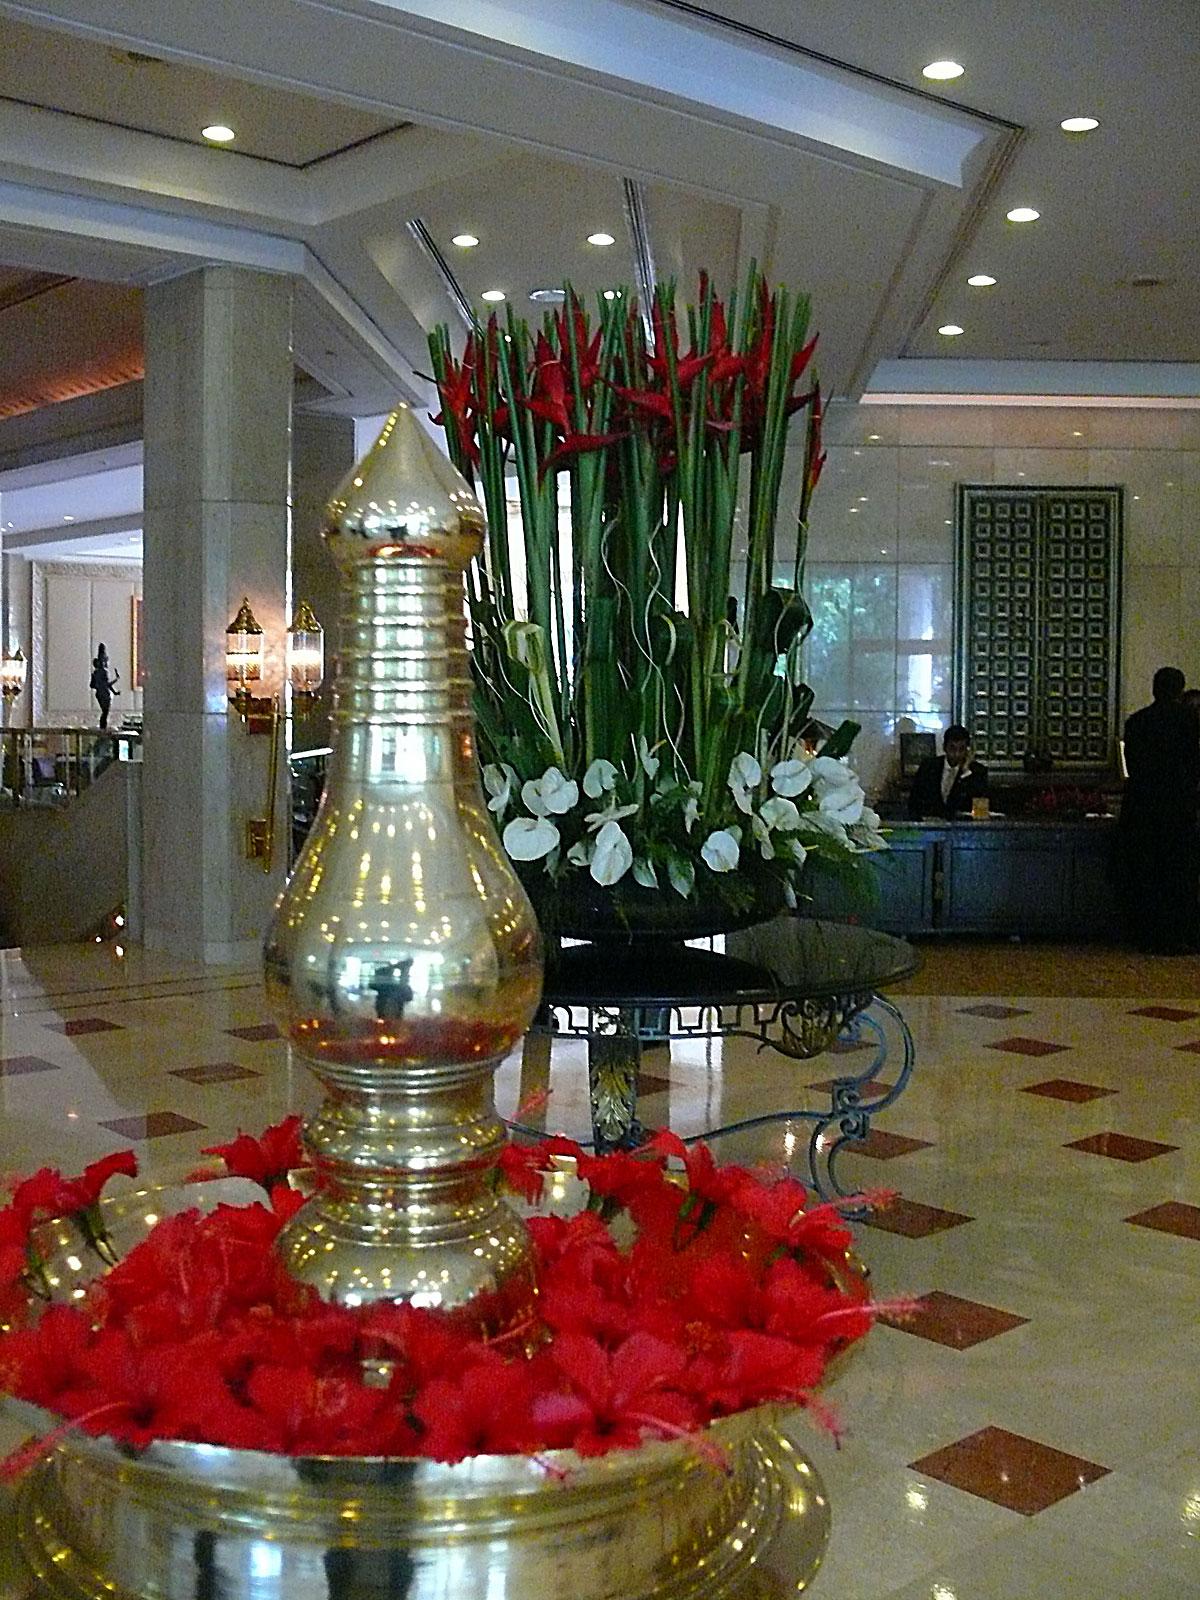 INDIEN MUMBAI Hotel The Leela FINEST-onTour P1030305.jpg